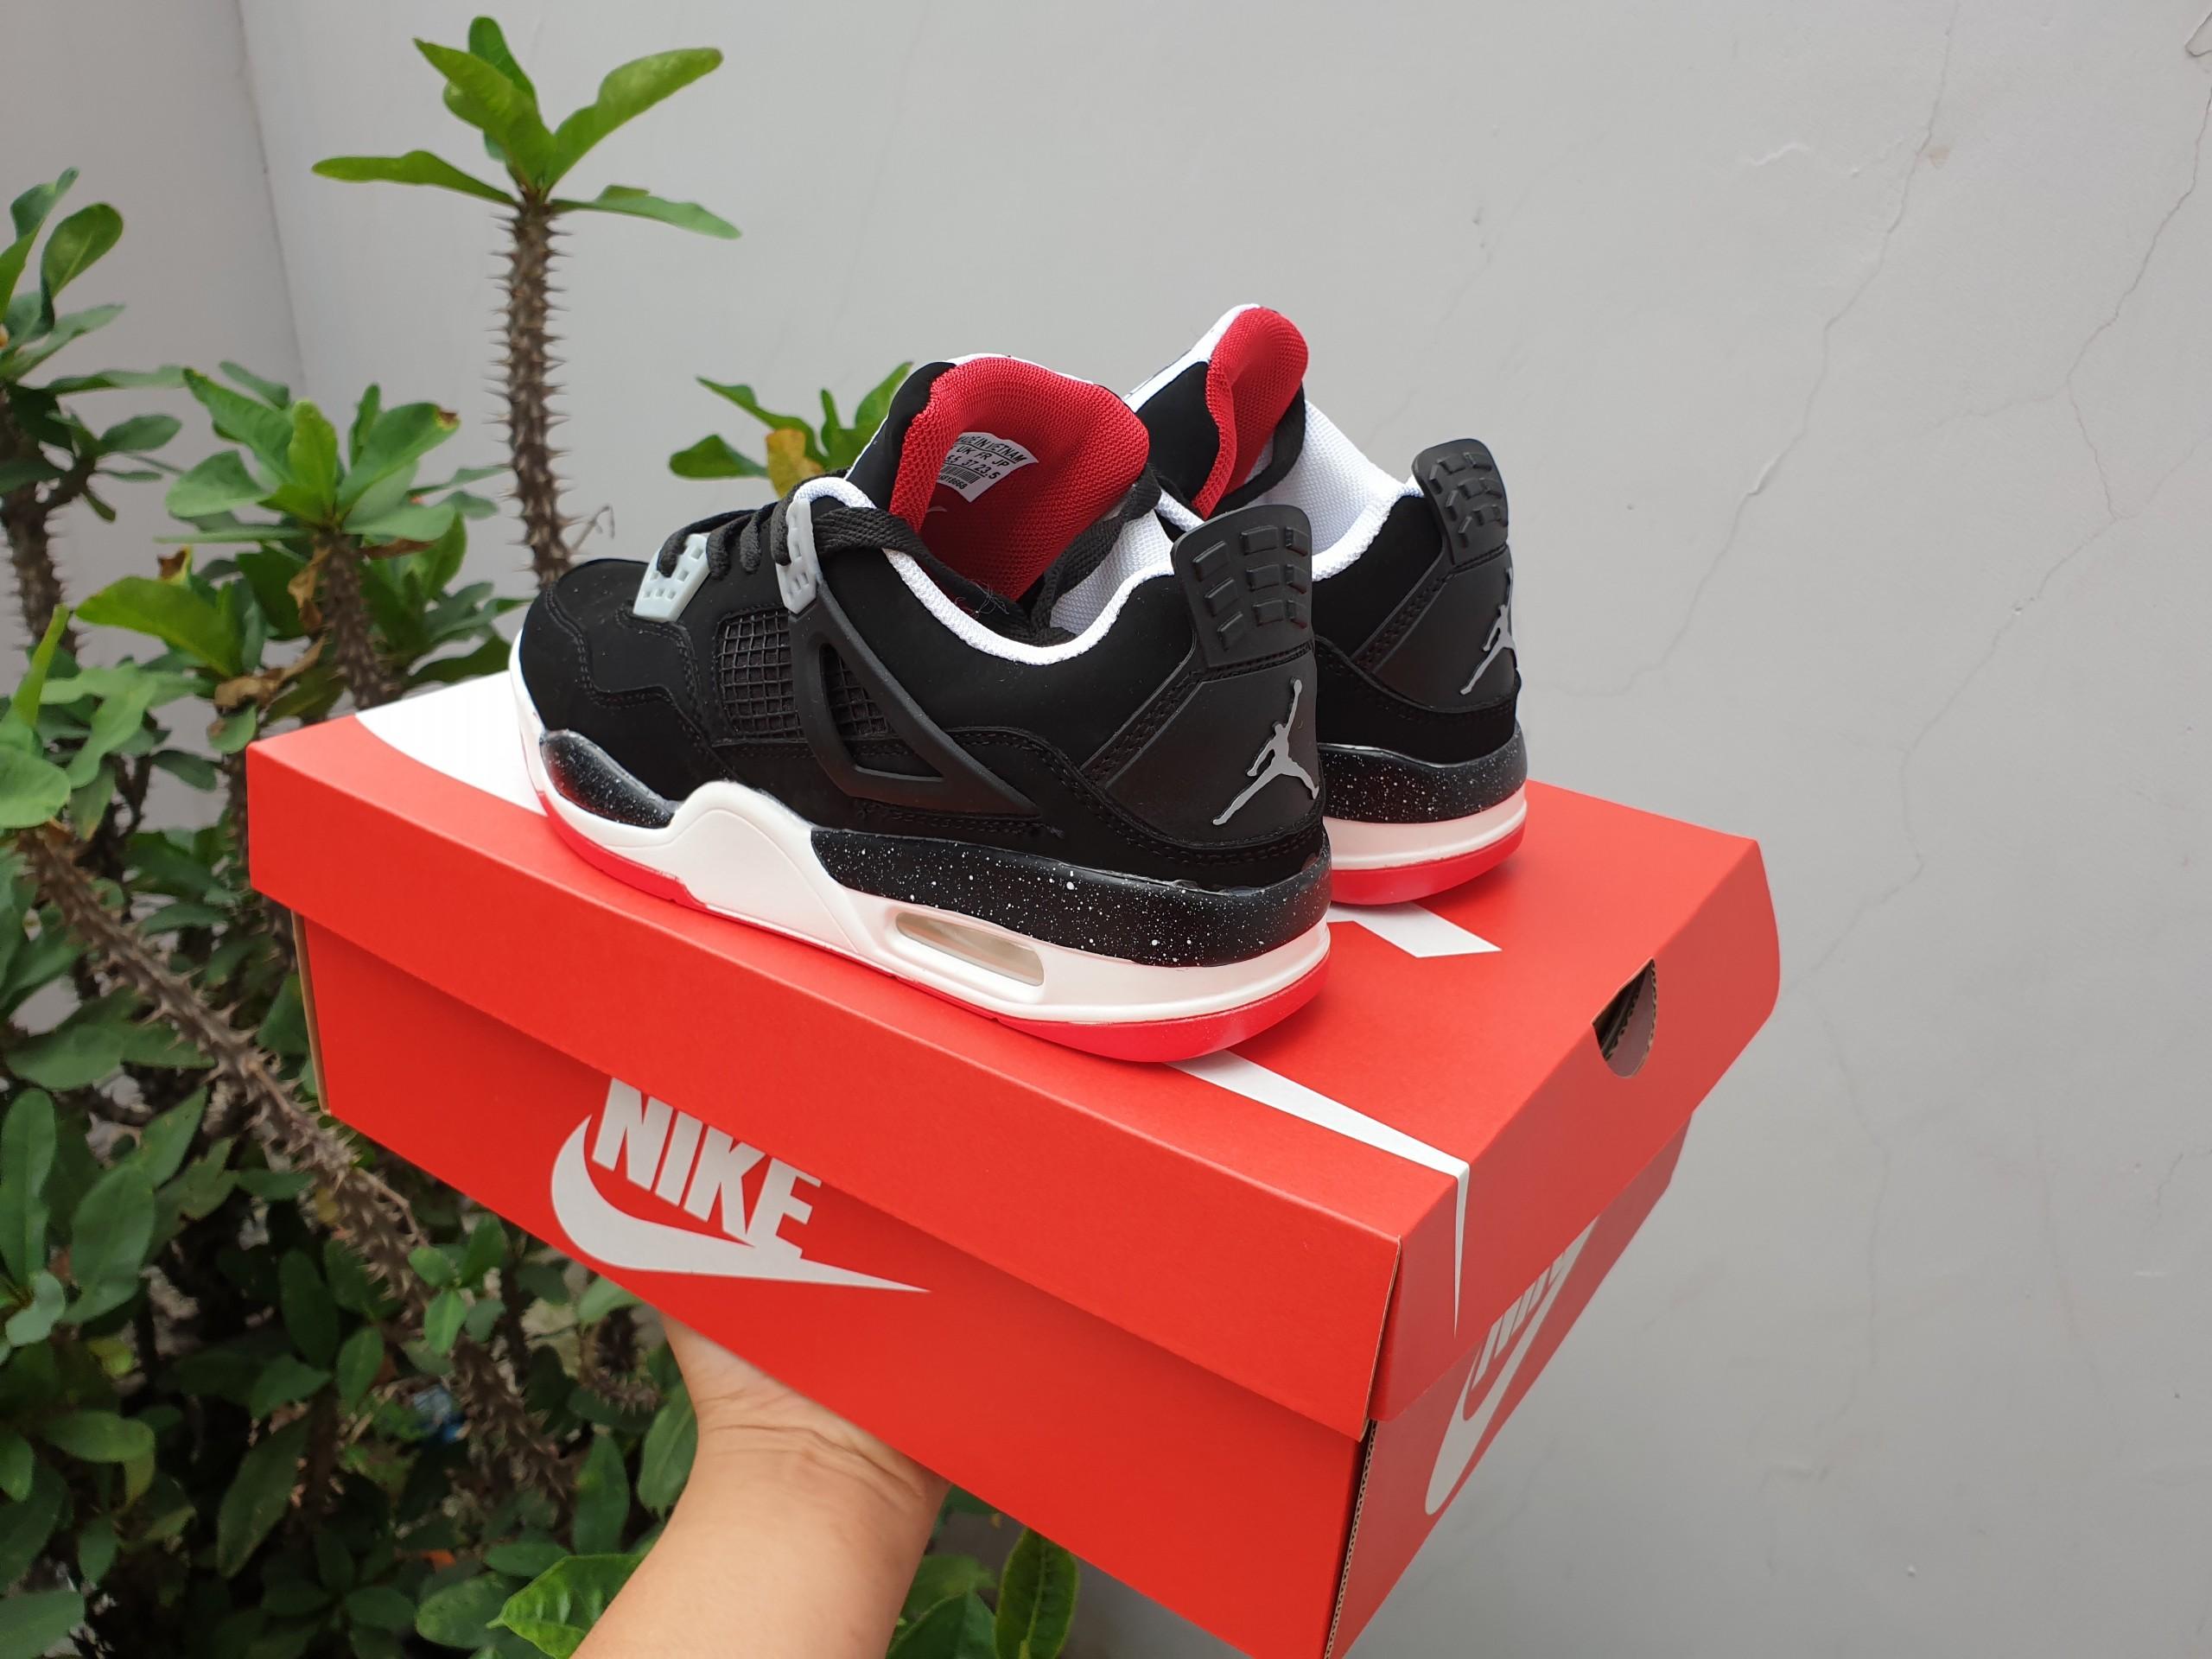 Giày jordan 4 đỏ đen